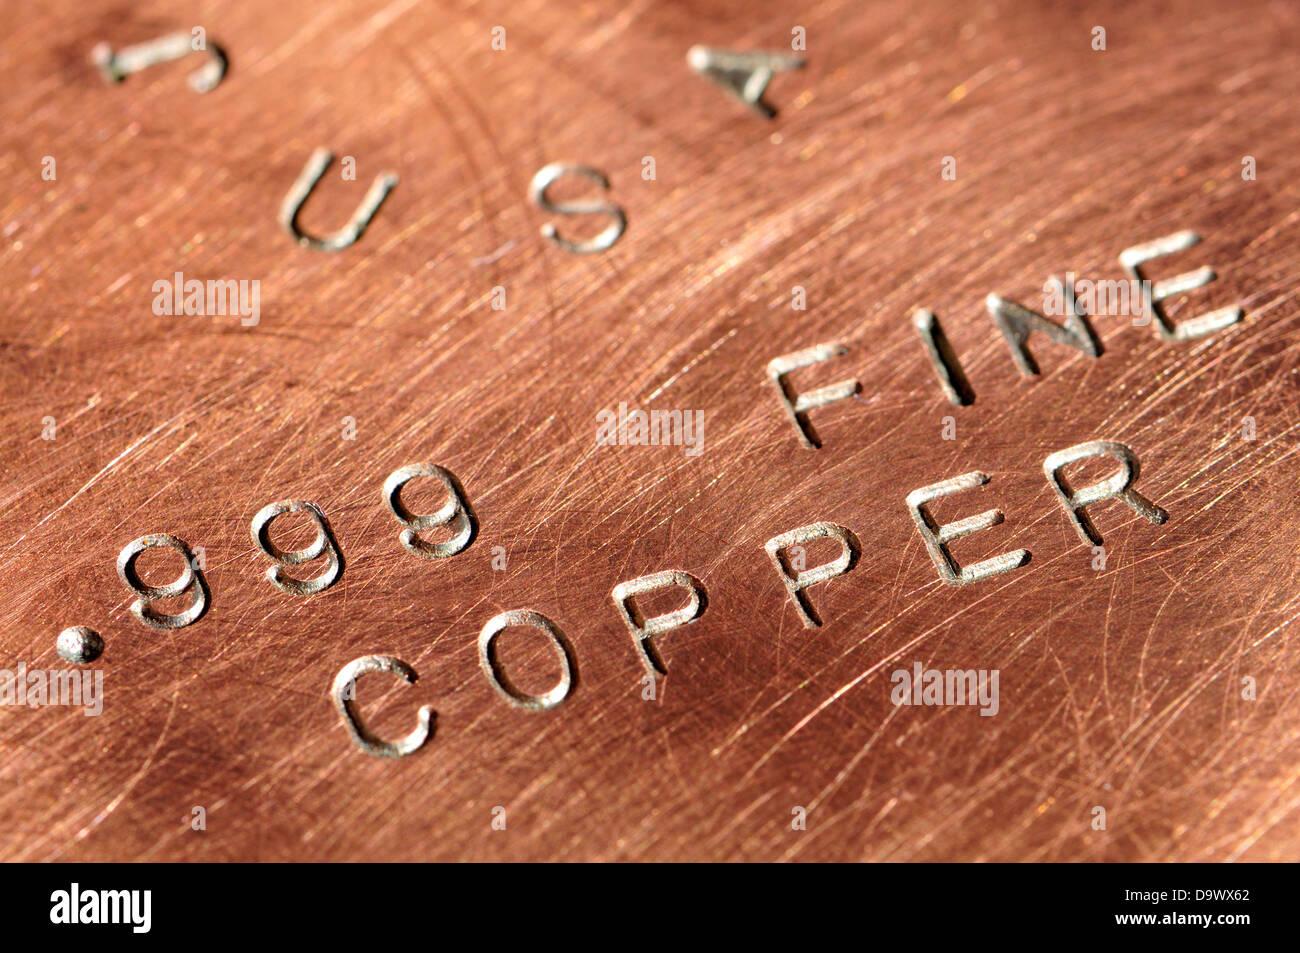 Copper bullion - 250g ingot of .999 purity - Stock Image